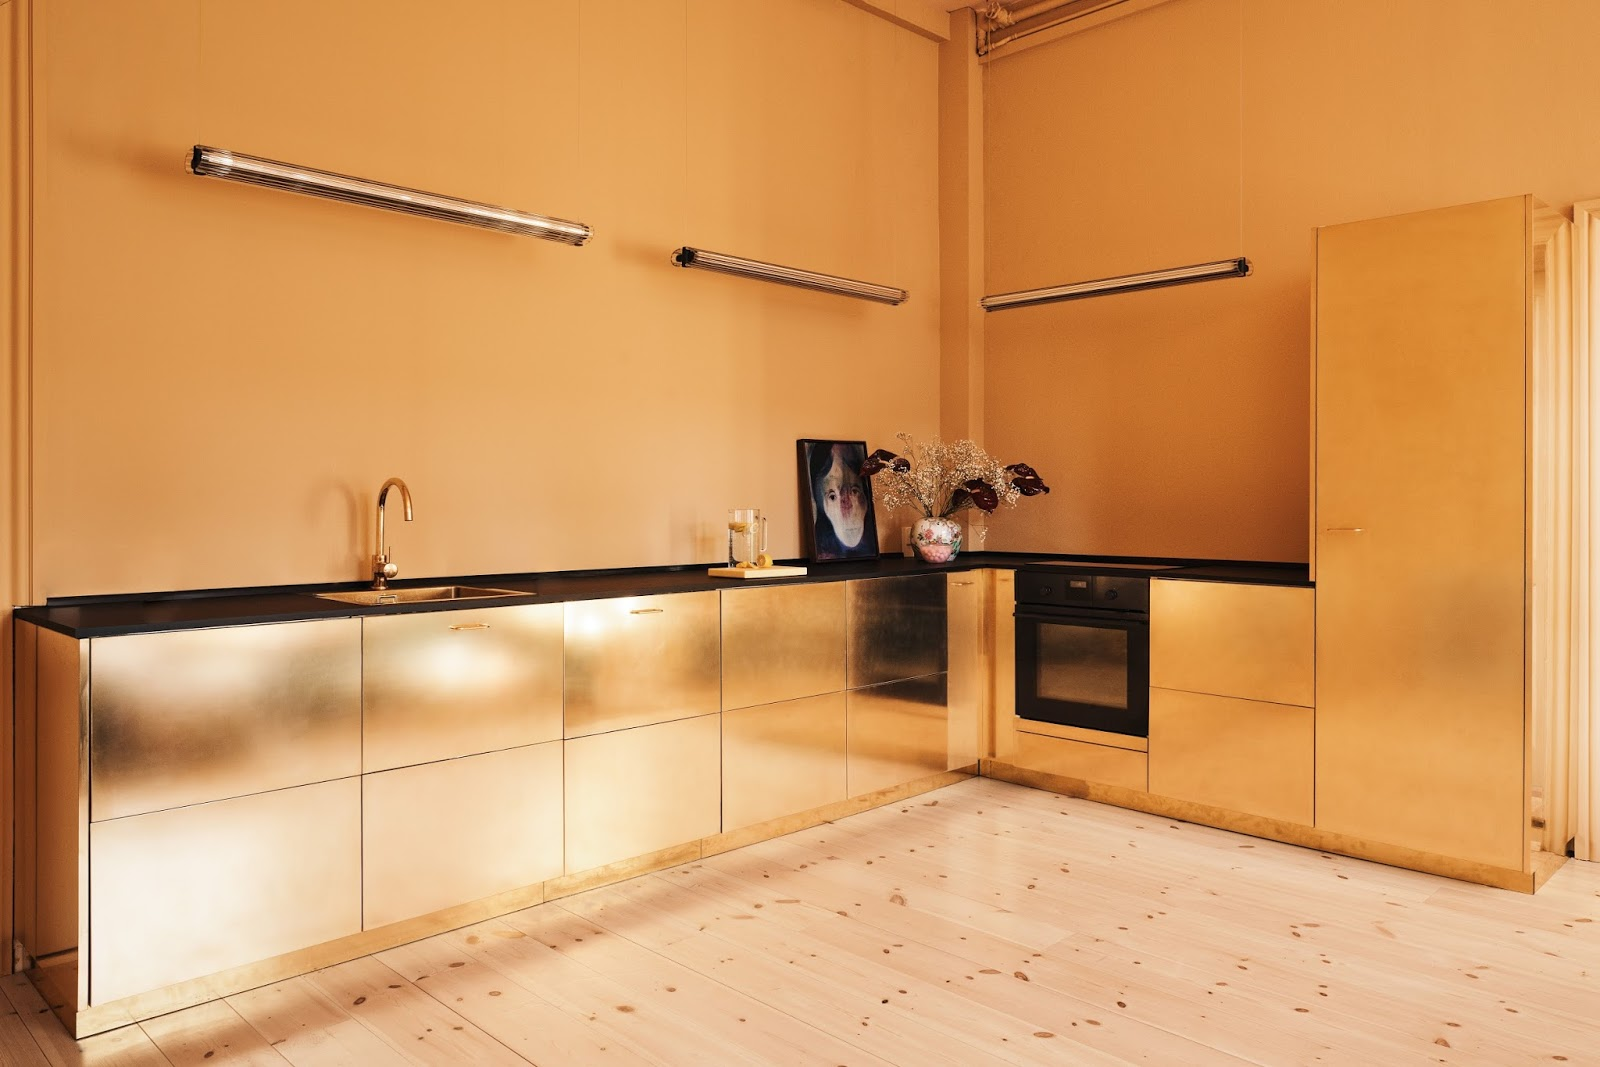 gold kitchen pics of cabinets amm blog the incredible fashion designer stine goya